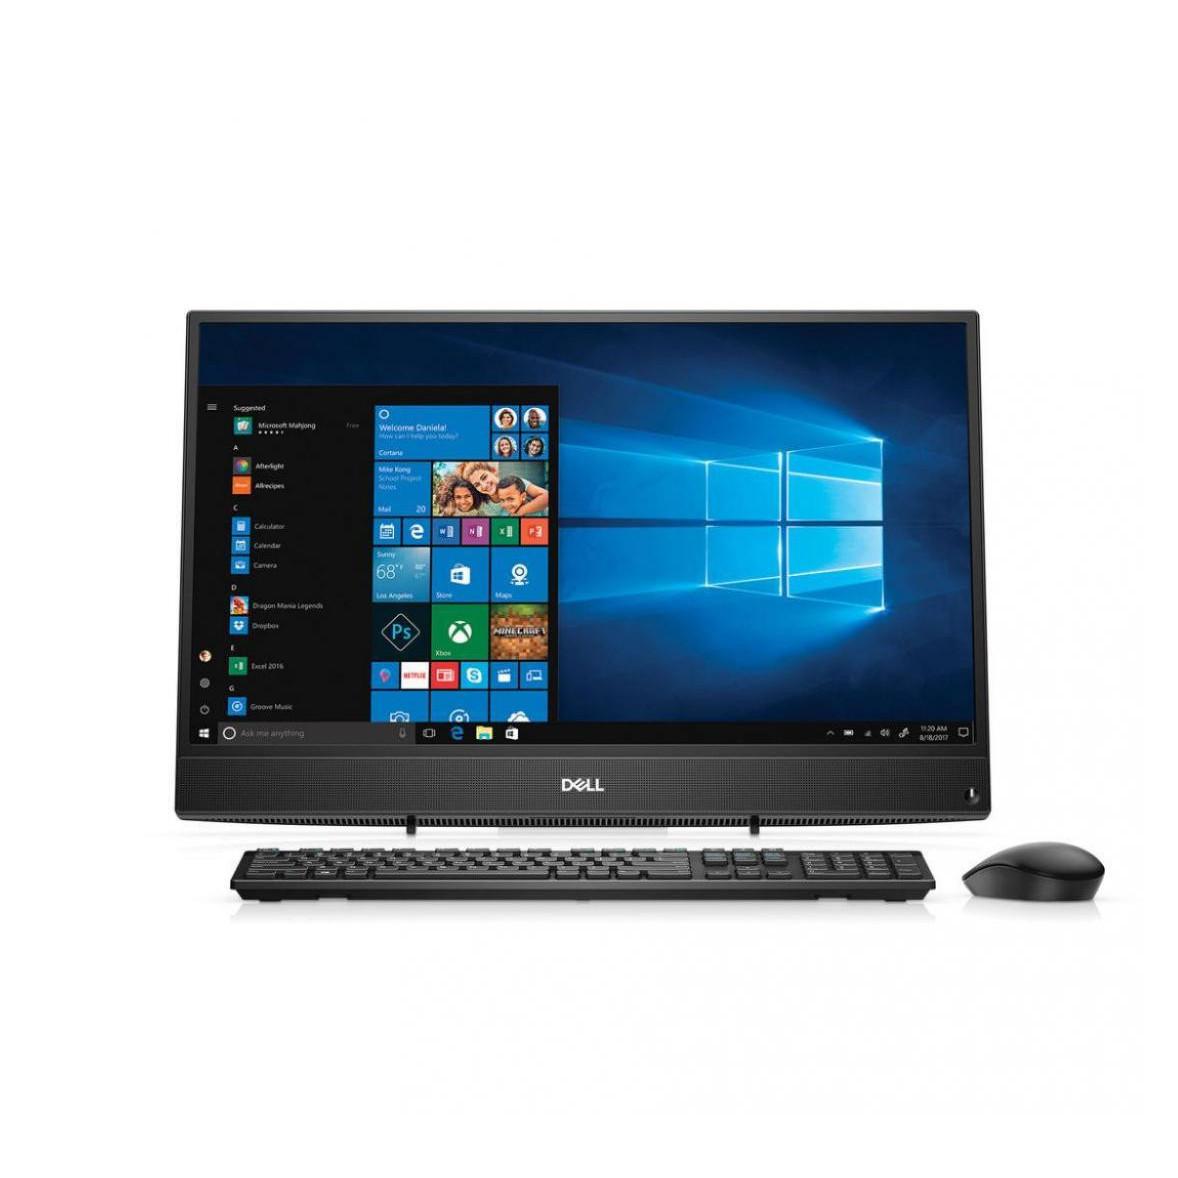 Моноблок Dell Inspiron 3280 Intel Core i5 4 ядра 4 Гб HDD 1Тб Windows 10 210-ARLI_3